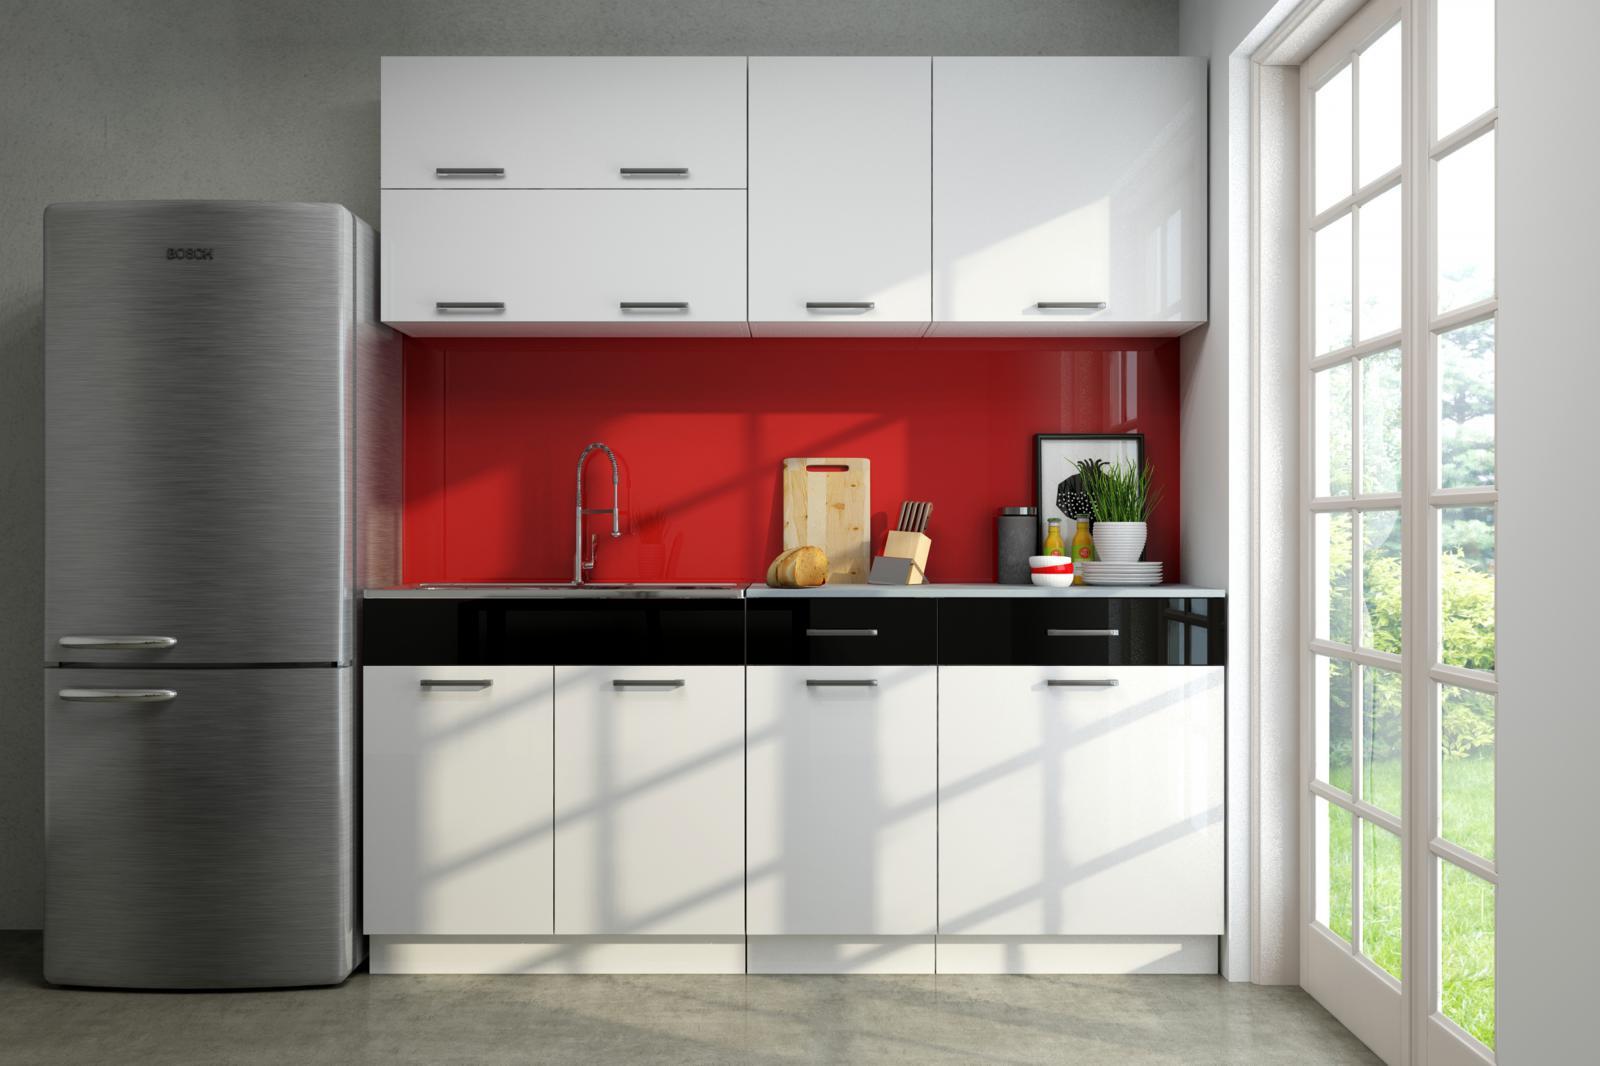 Kuchyňská linka Gigue 180 bílý lesk/černý pruh